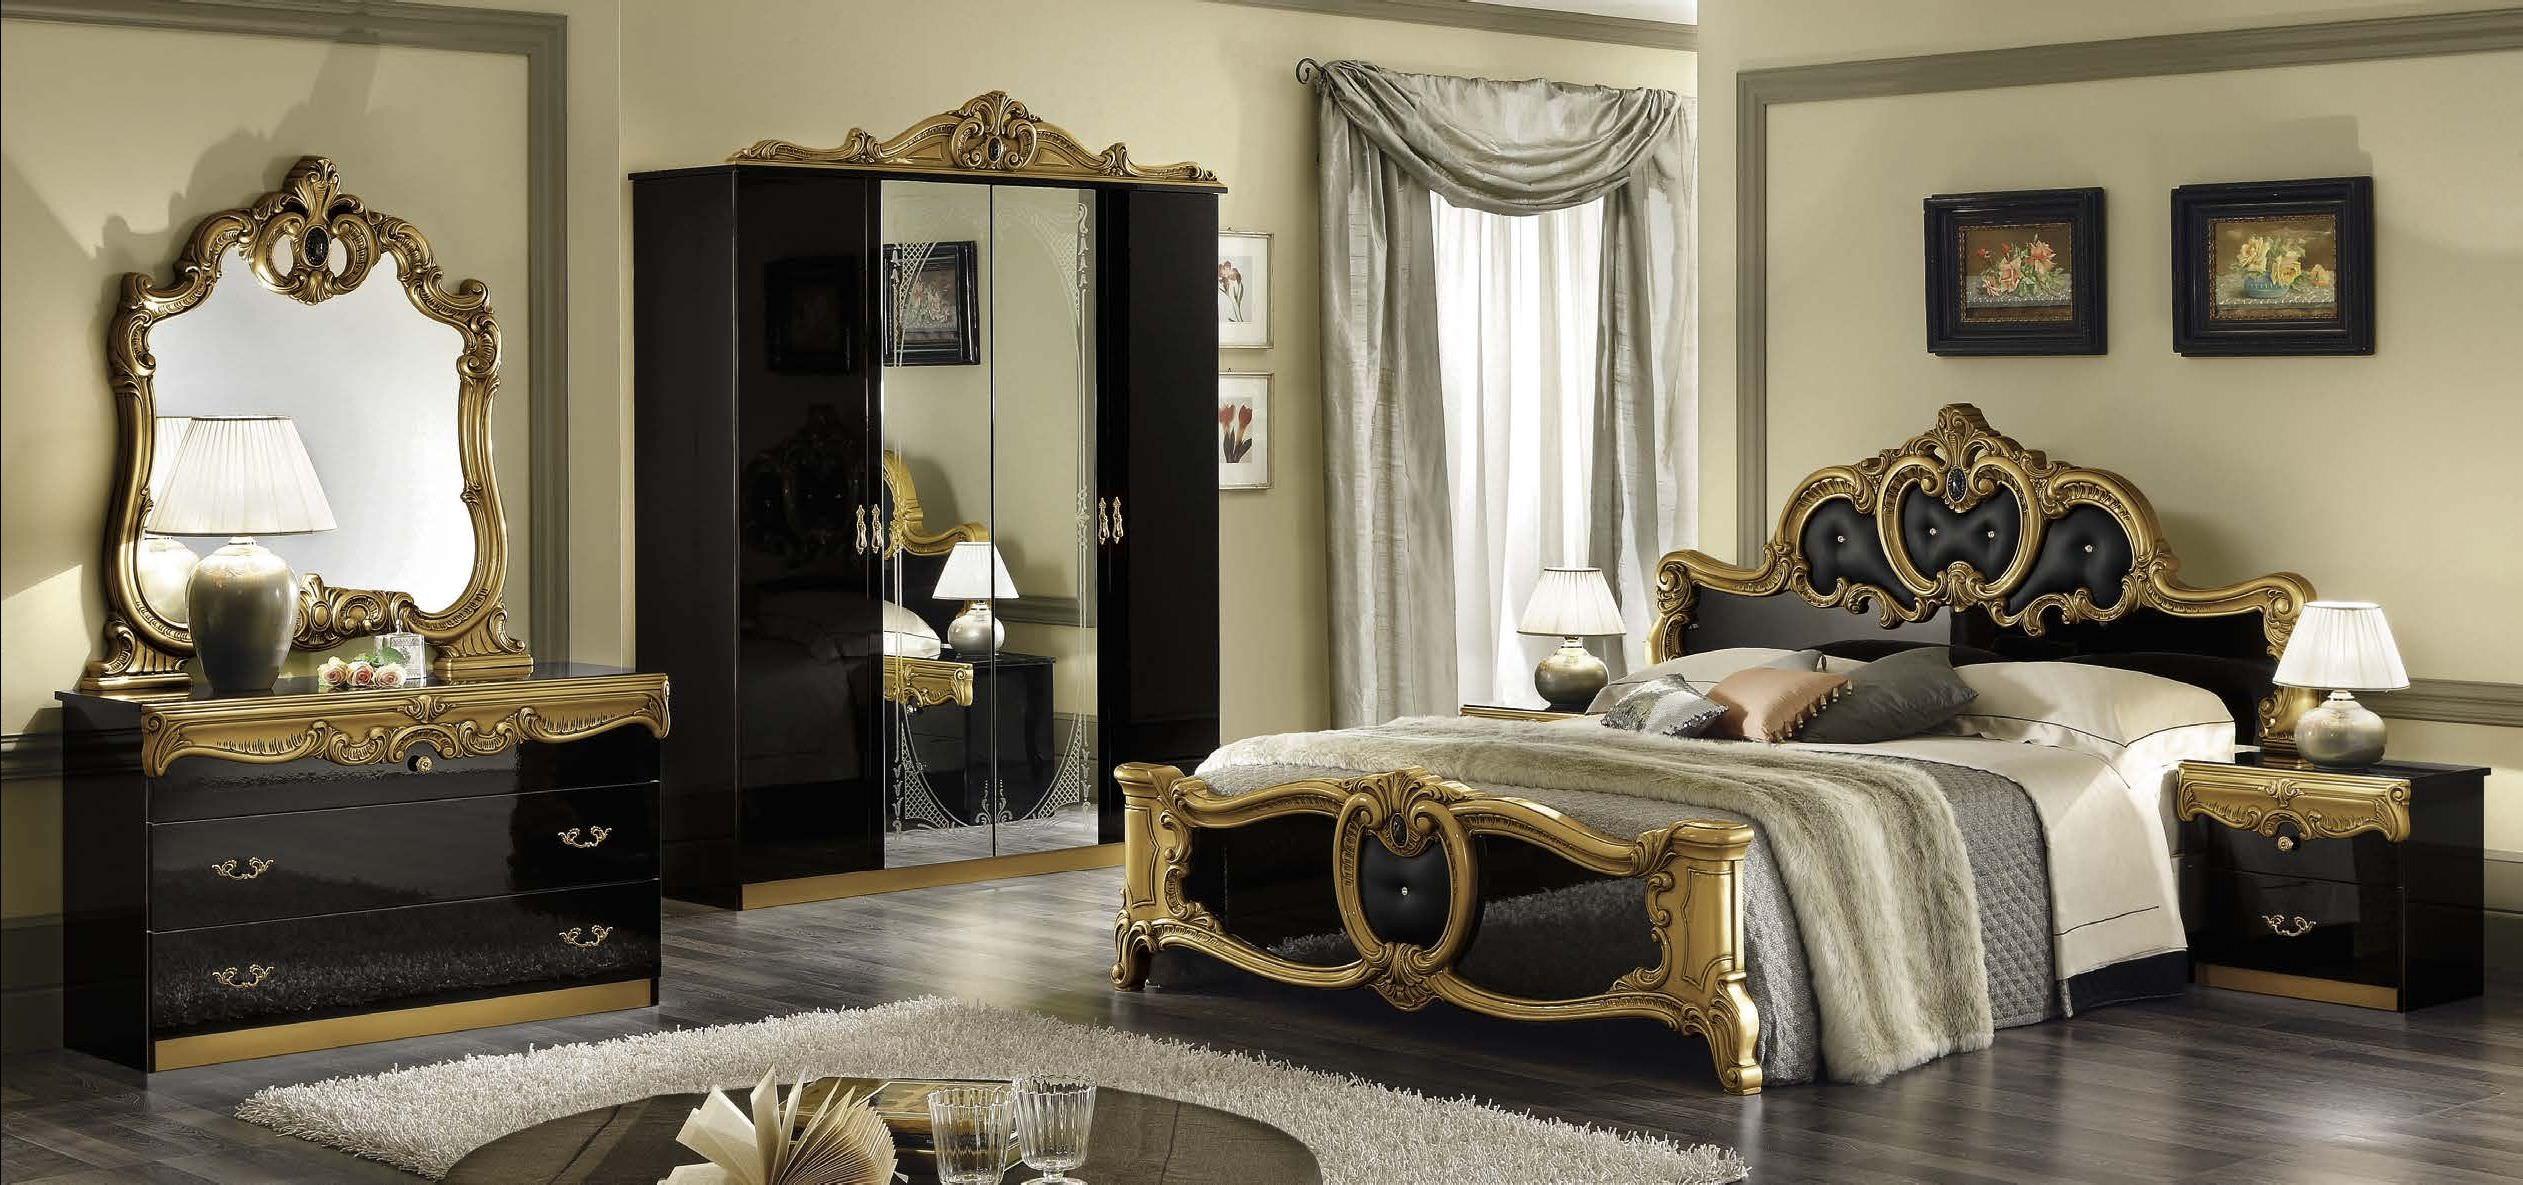 black and gold bedroom design photo - 4